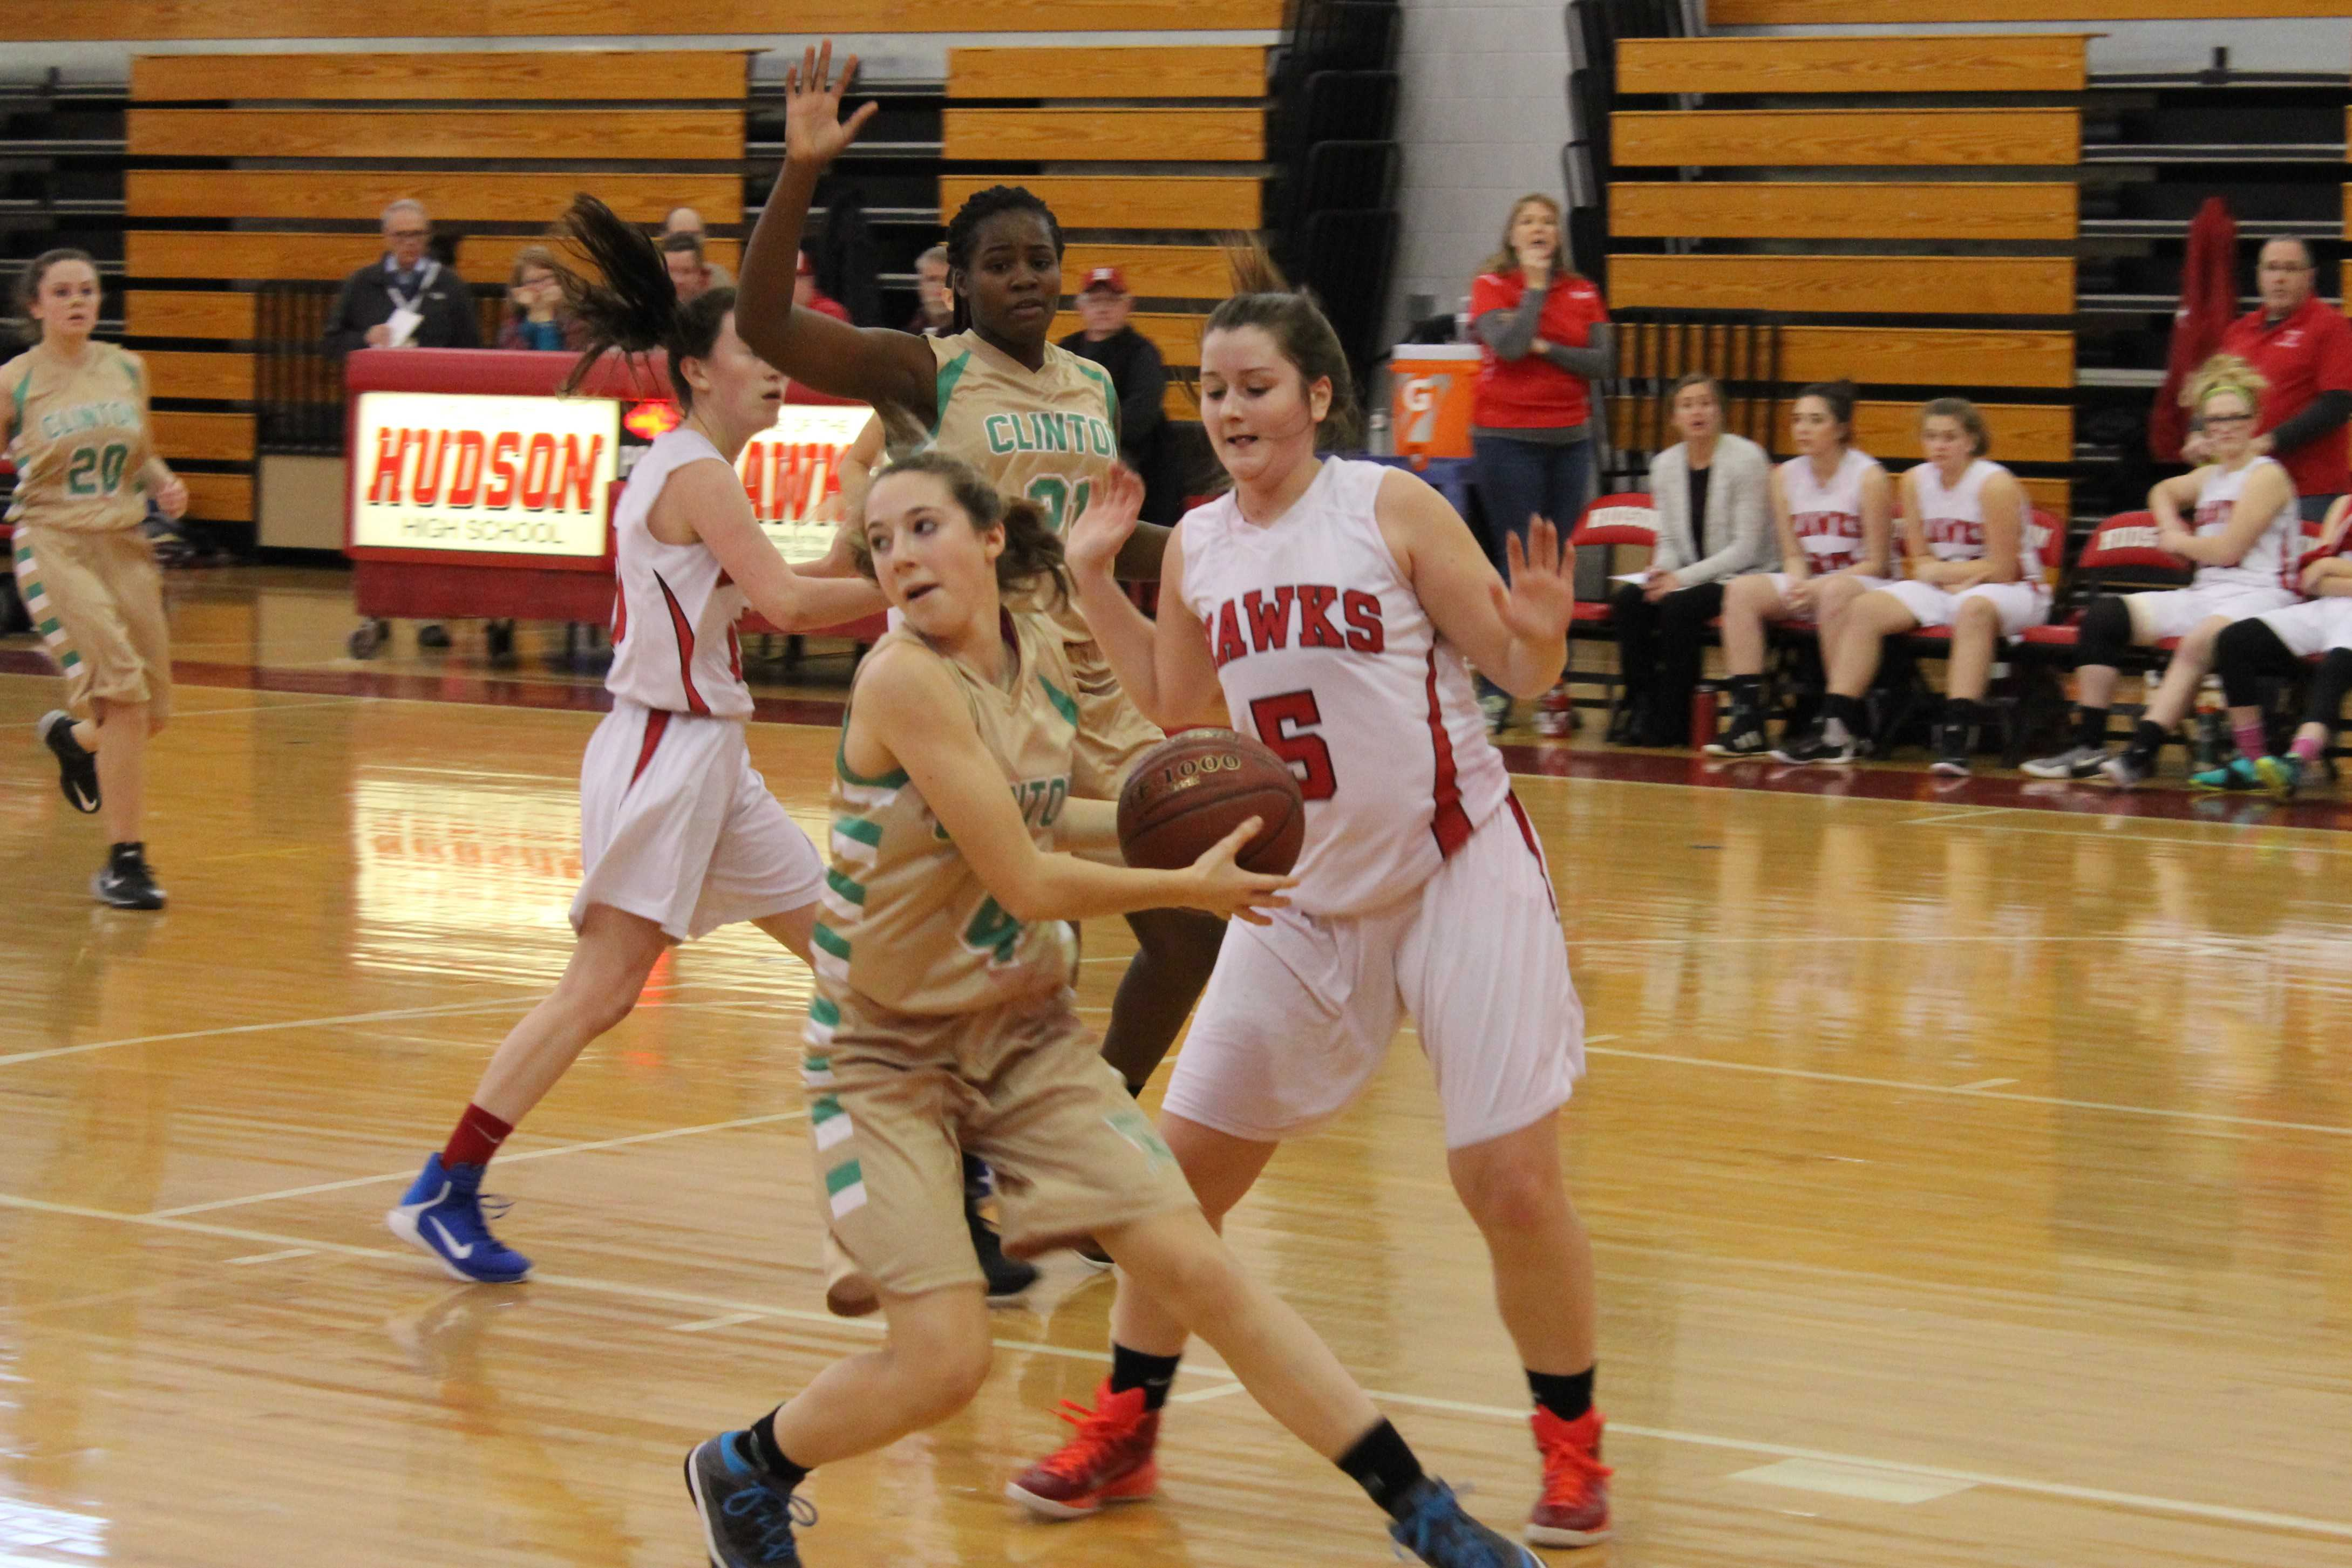 Regan Gannon spins away from the defense of Hudson's Emily O'Neil in the second quarter. | by Dakota Antelman